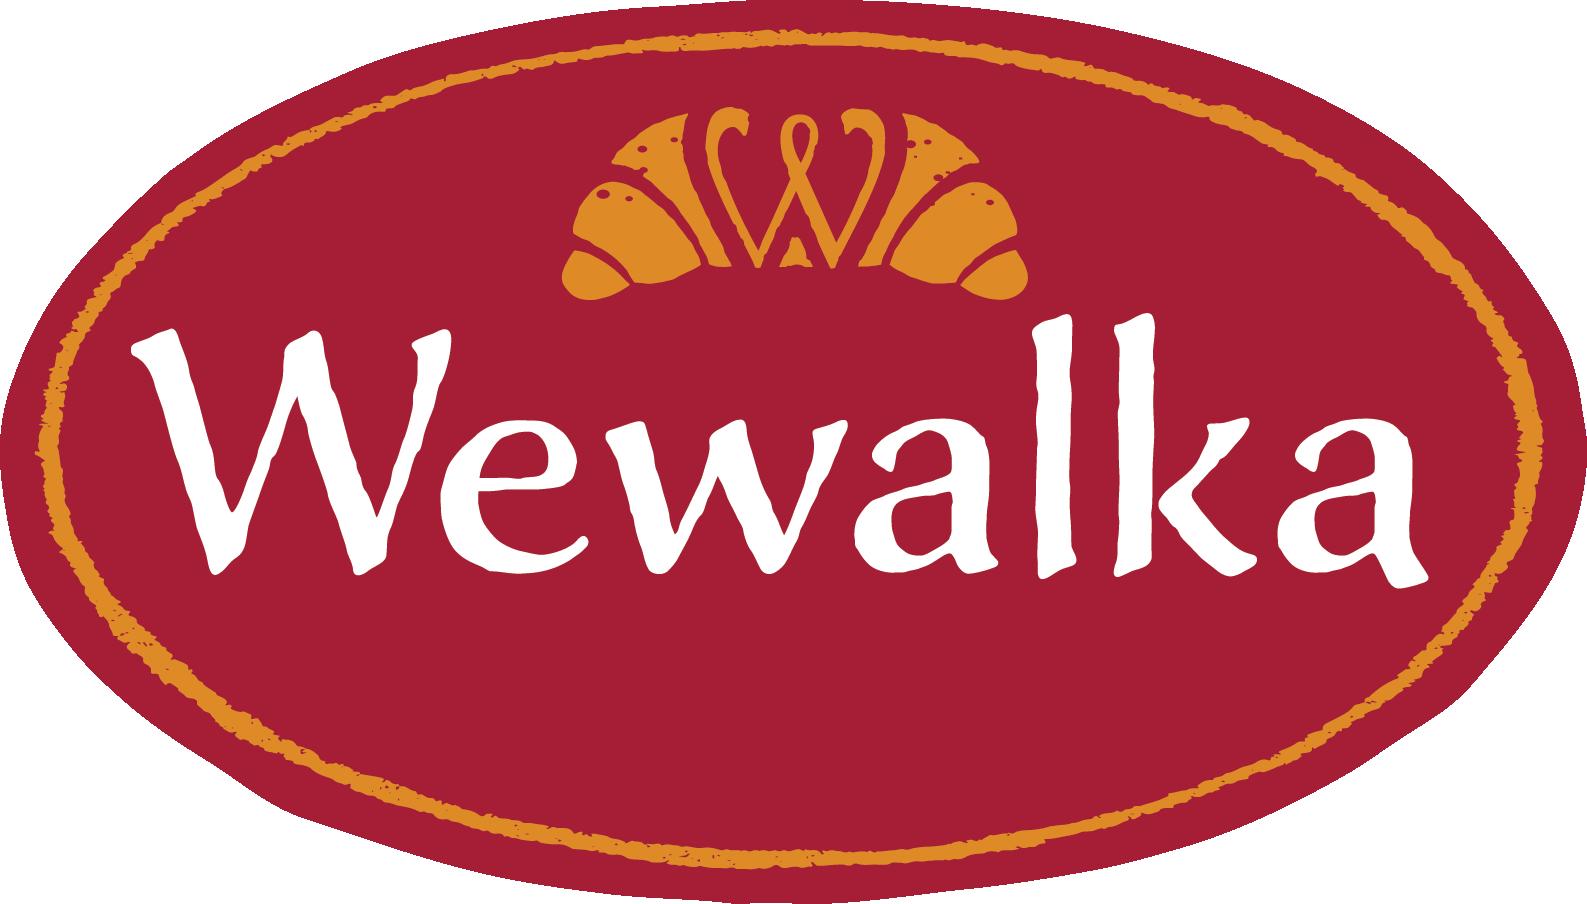 Wewalka logo